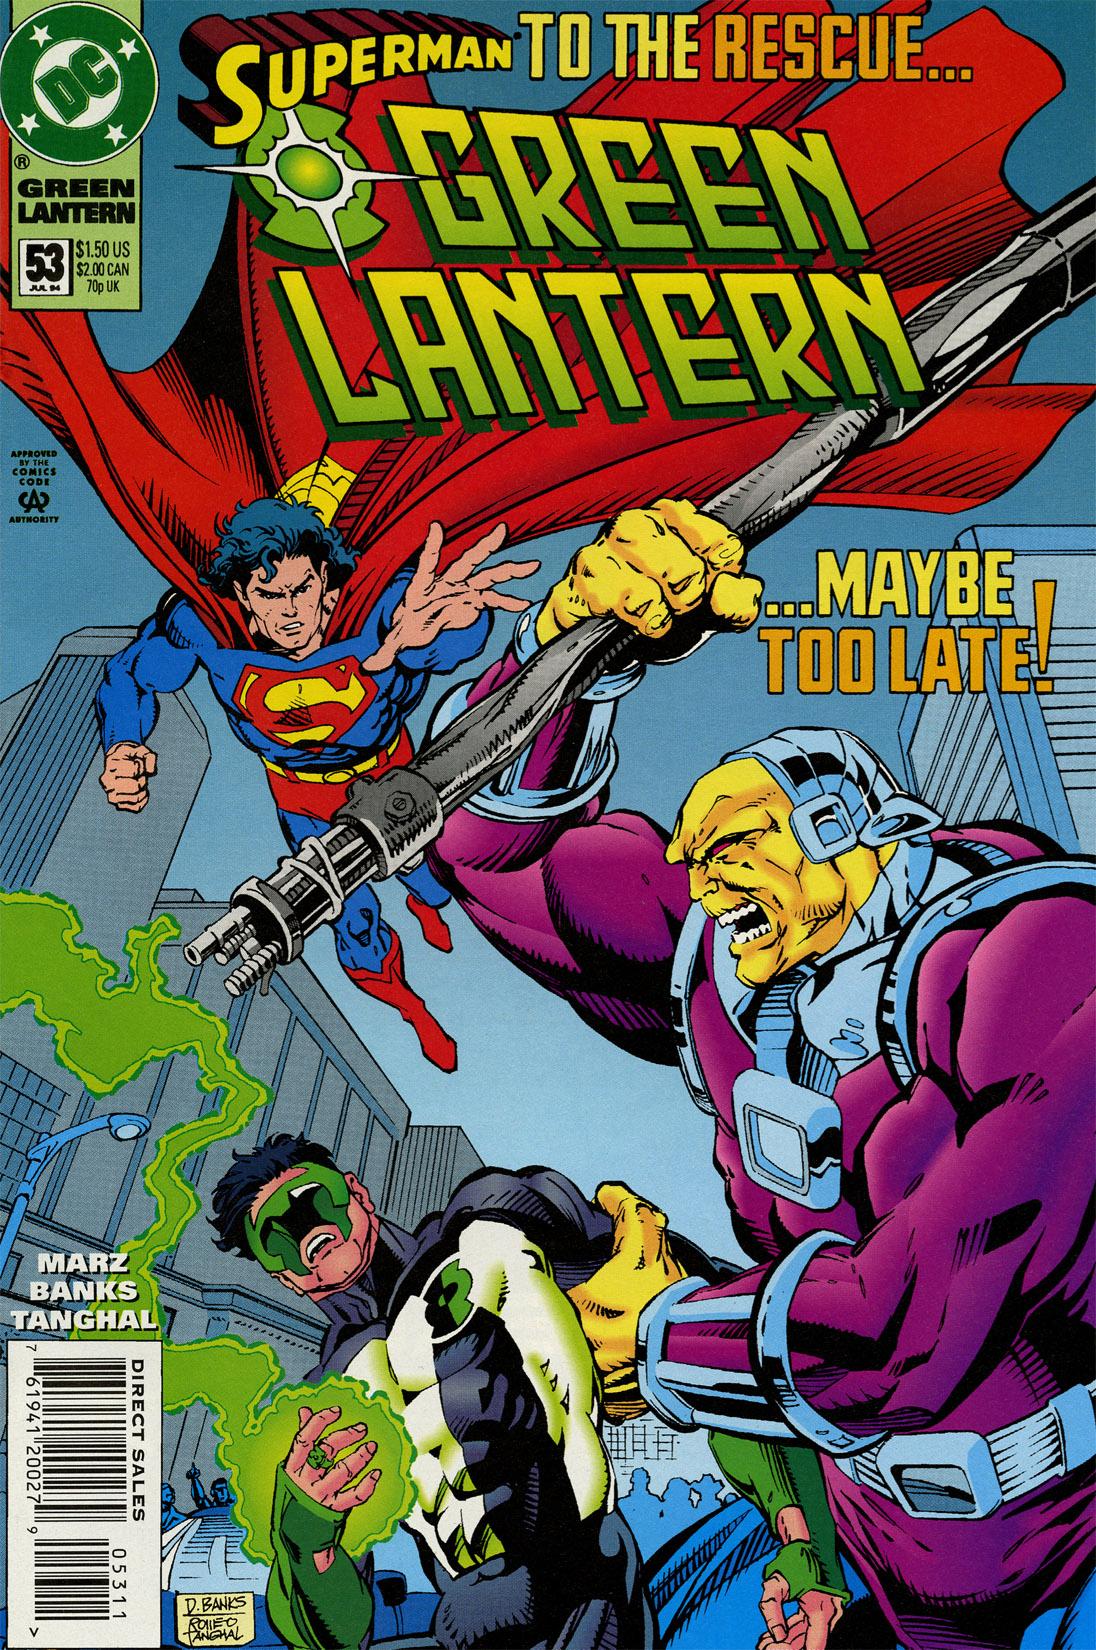 Green Lantern (1990) 53 Page 1